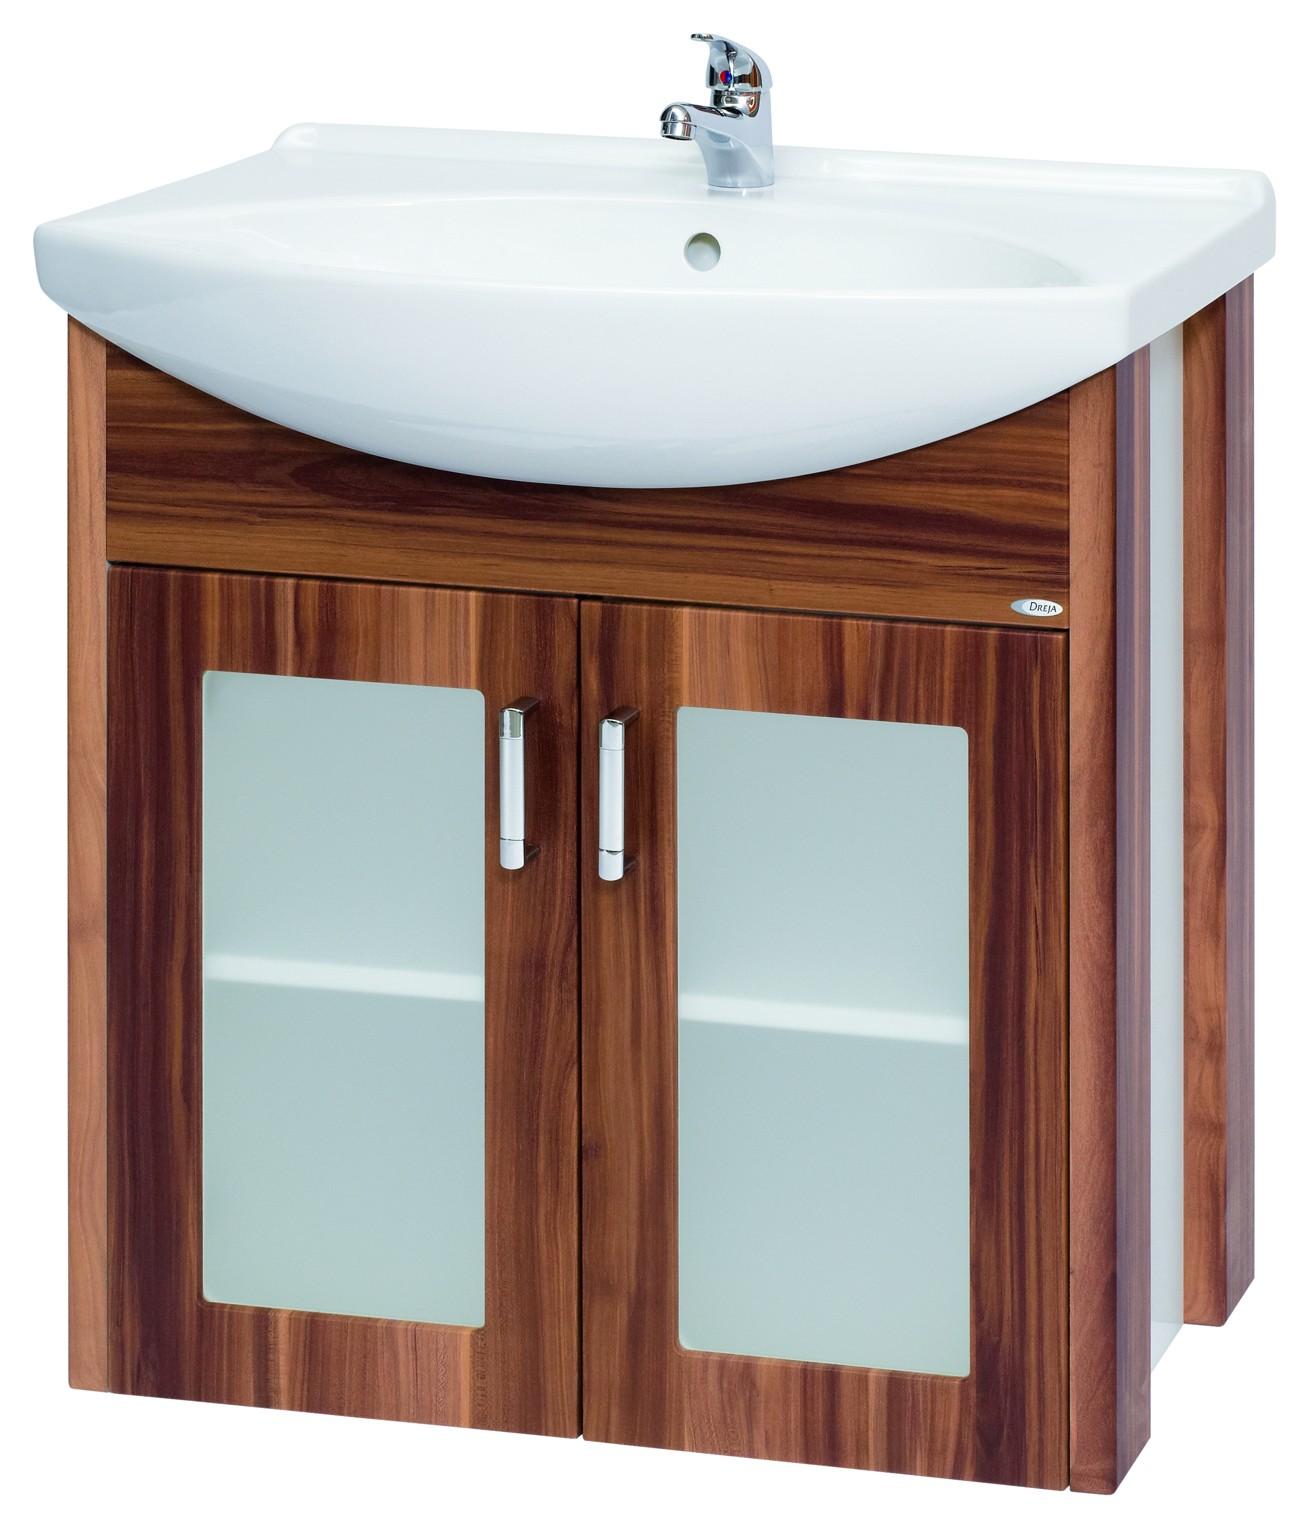 Тумба под раковину DrejaМебель для ванной комнаты<br>Тип: тумба,<br>Тип установки мебели для ванной: под раковину,<br>Материал изготовления мебели для ванной: дсп,<br>Цвет мебели для ванной: цвета под дерево,<br>Коллекция: lafutura<br>